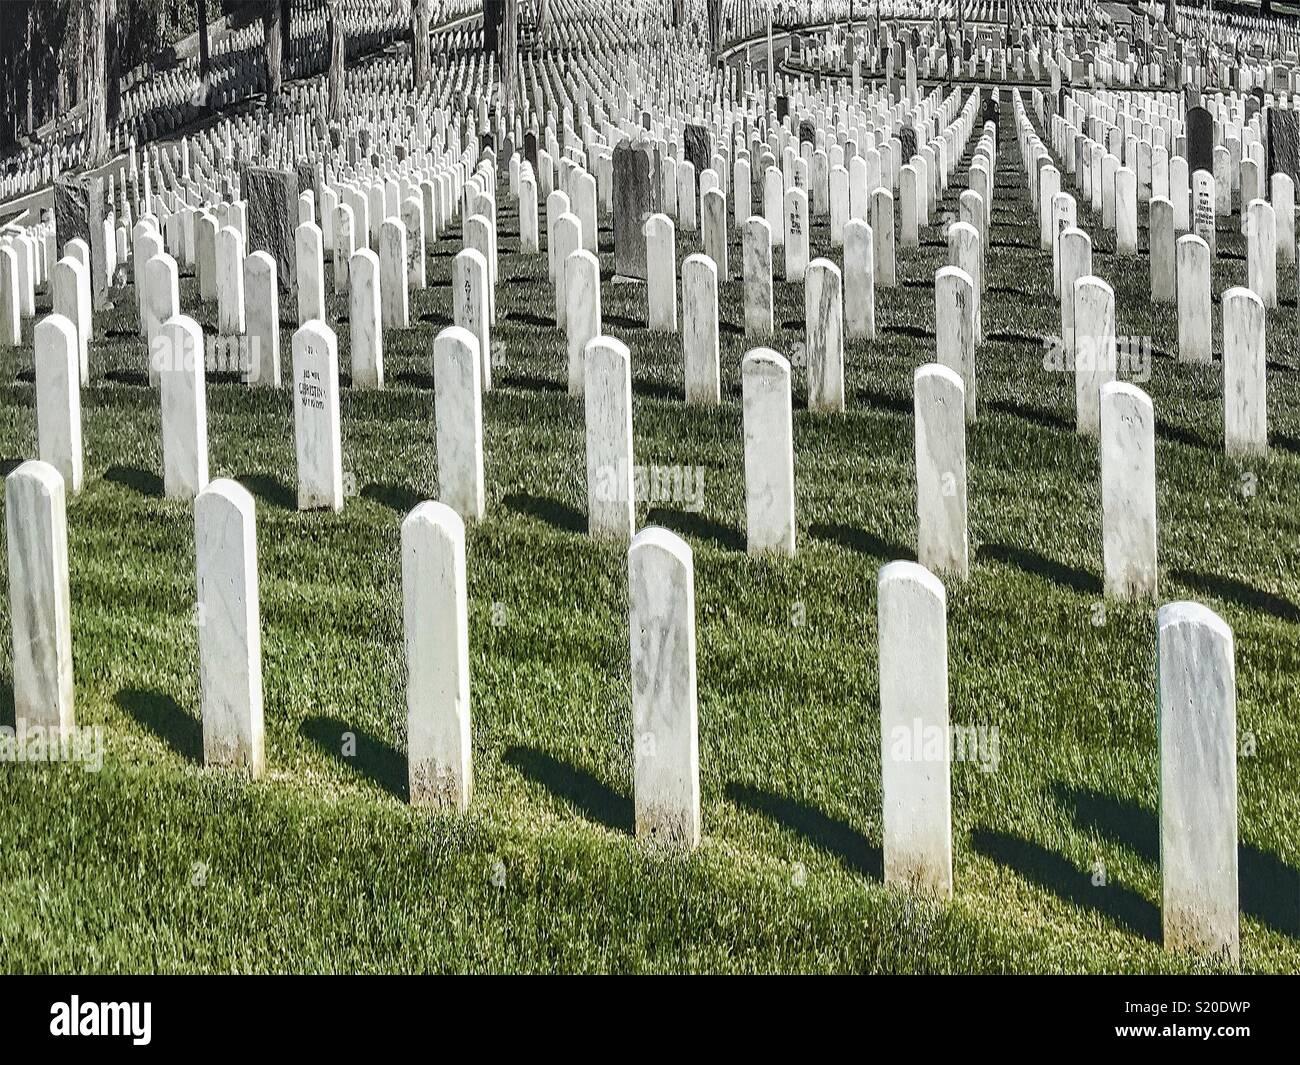 Endless gravesites at Naval cemetery in the Presidio, San Francisco - Stock Image